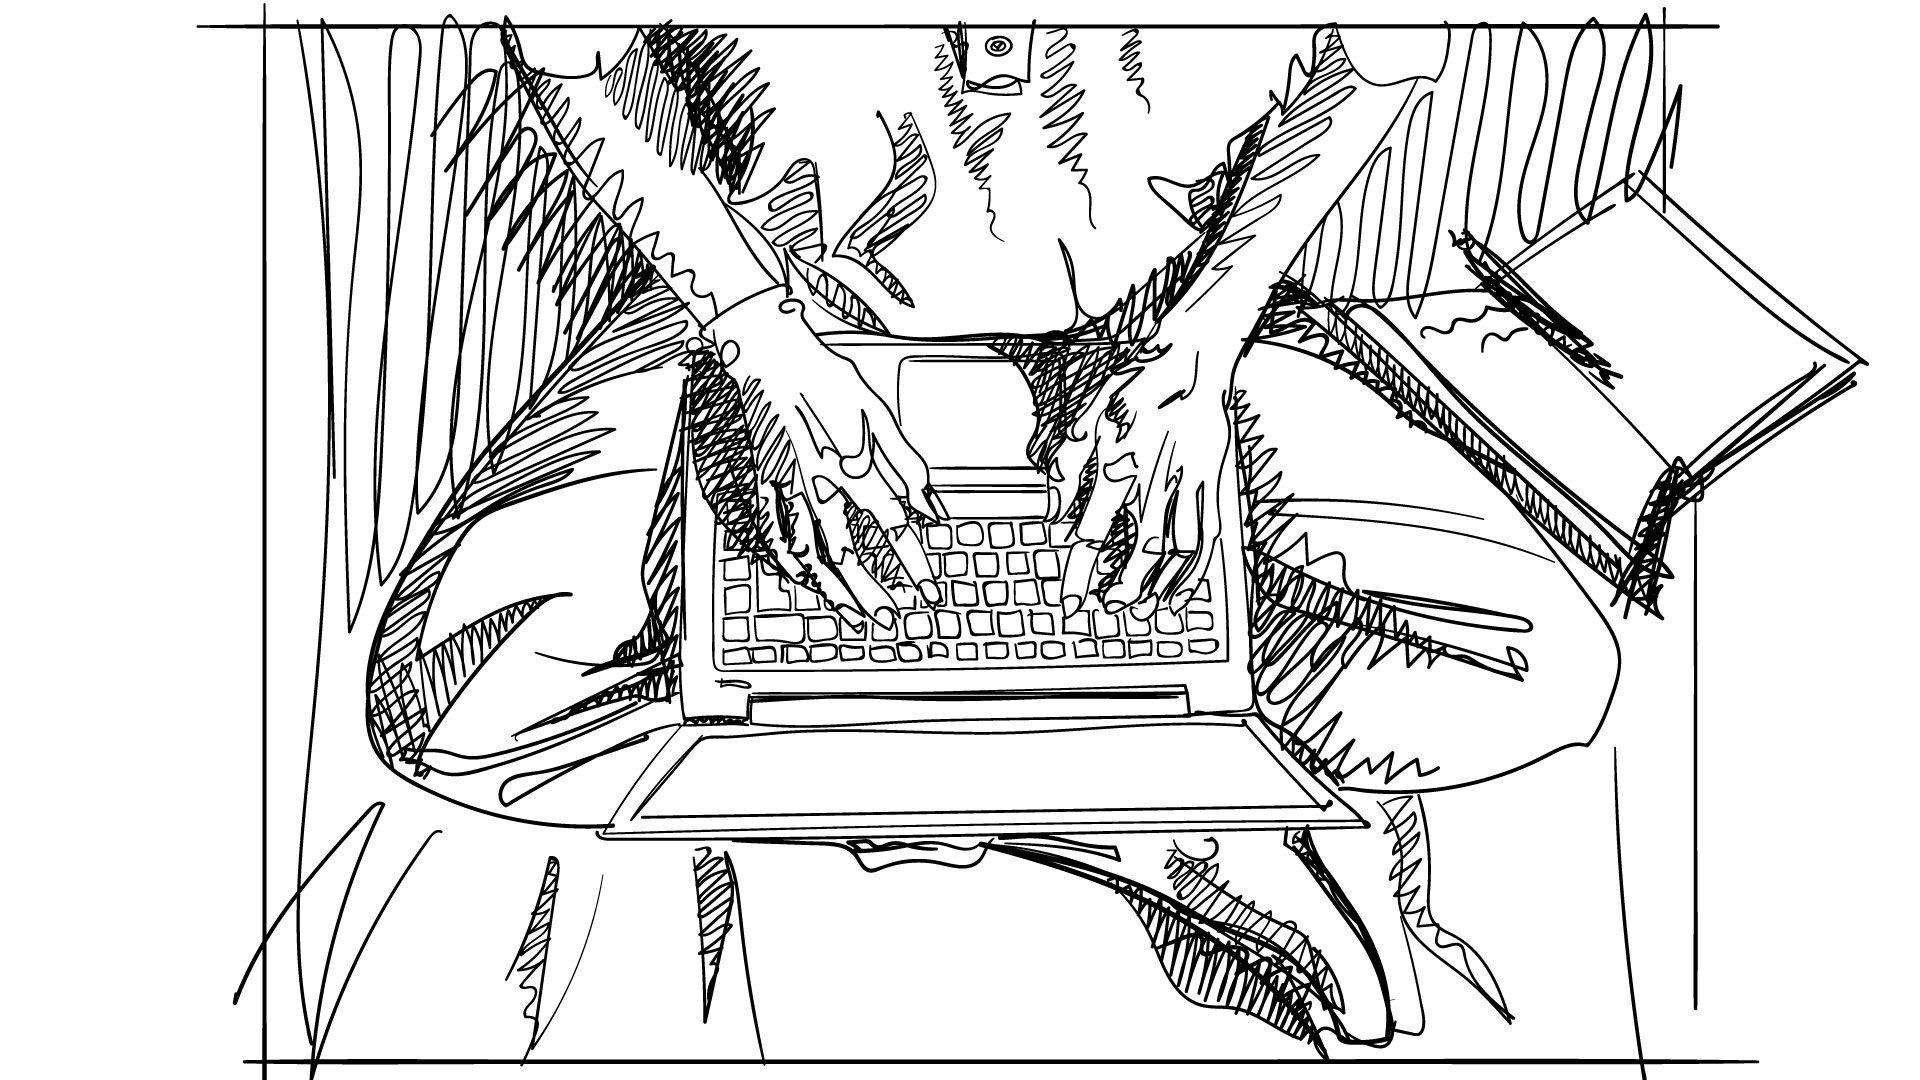 Student redacteaza o disertatie de arhitectura pe laptop, in timp ce sta in pat.